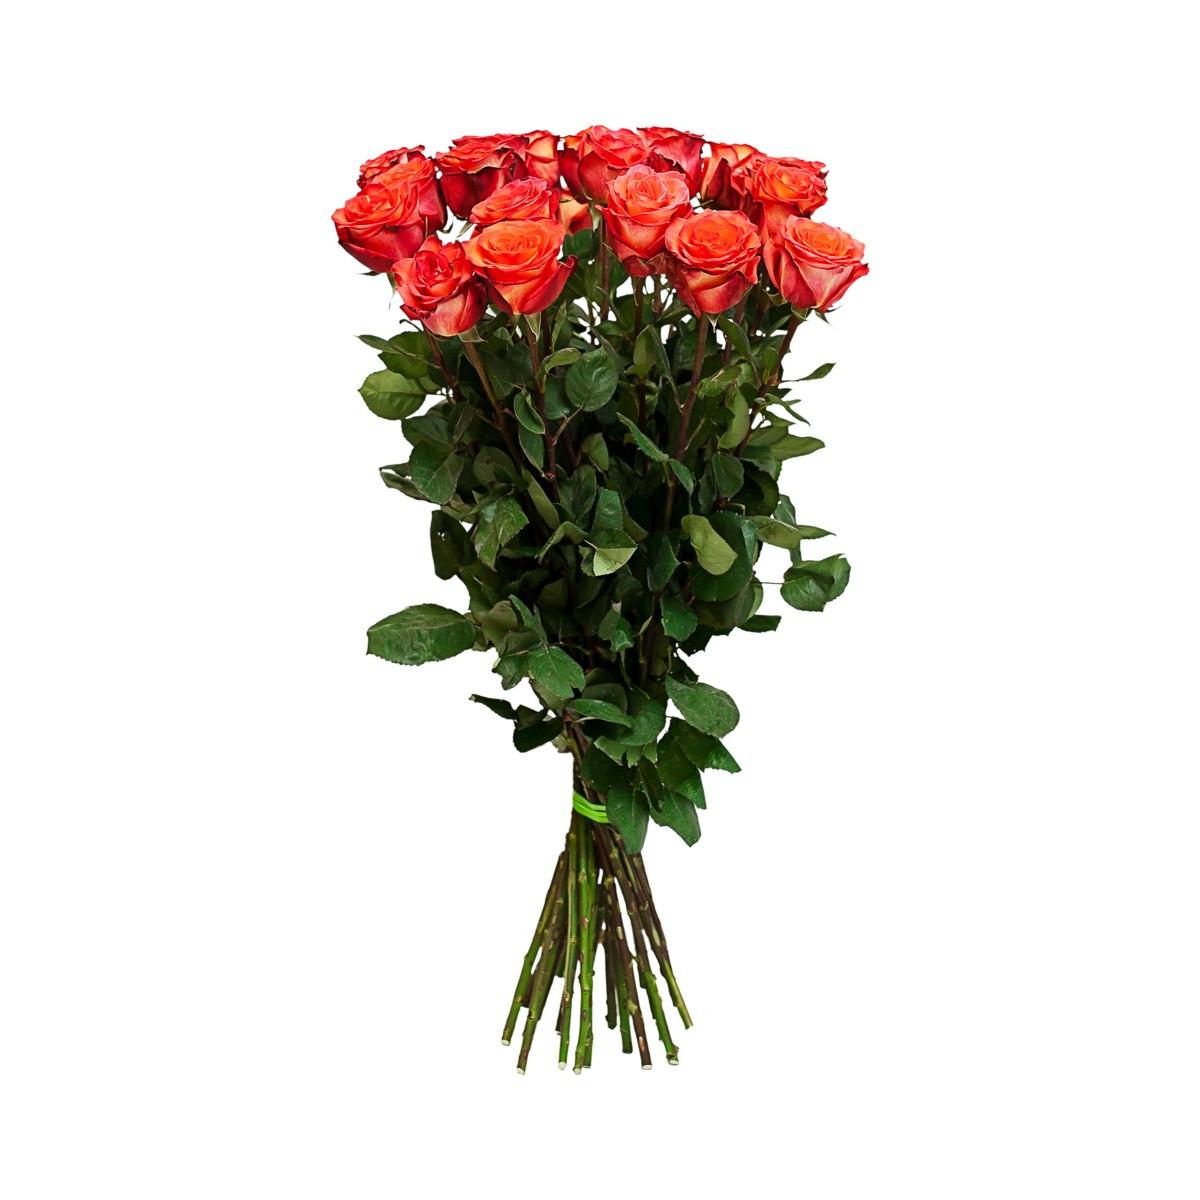 Букет от 11 до 15 оранжеви рози (ти избираш броя)